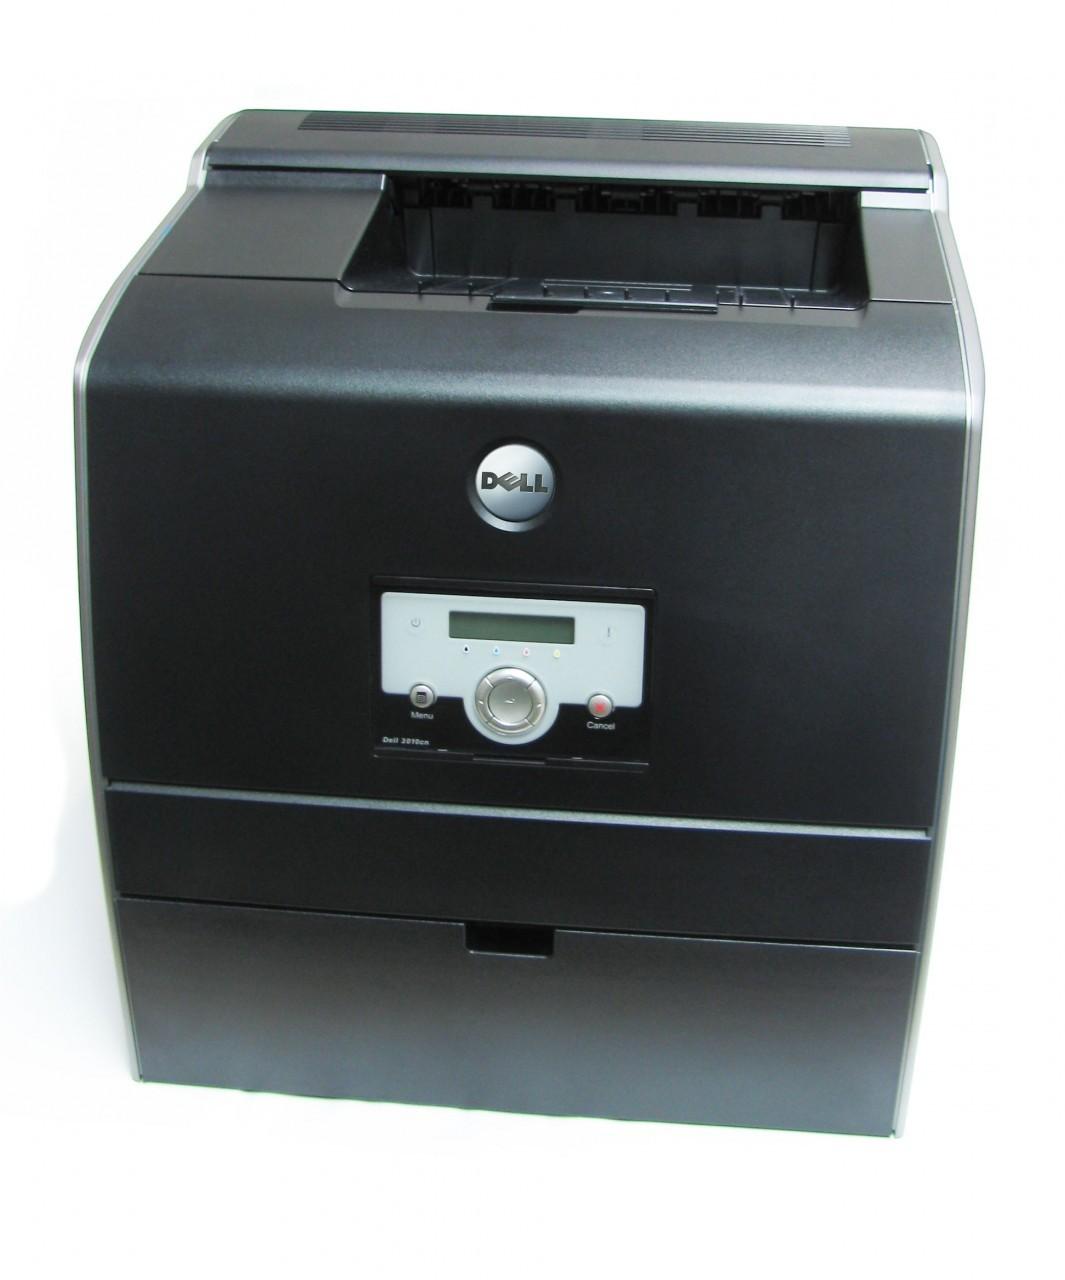 Dell 3110CN Color Laser Printer RECONDITIONED